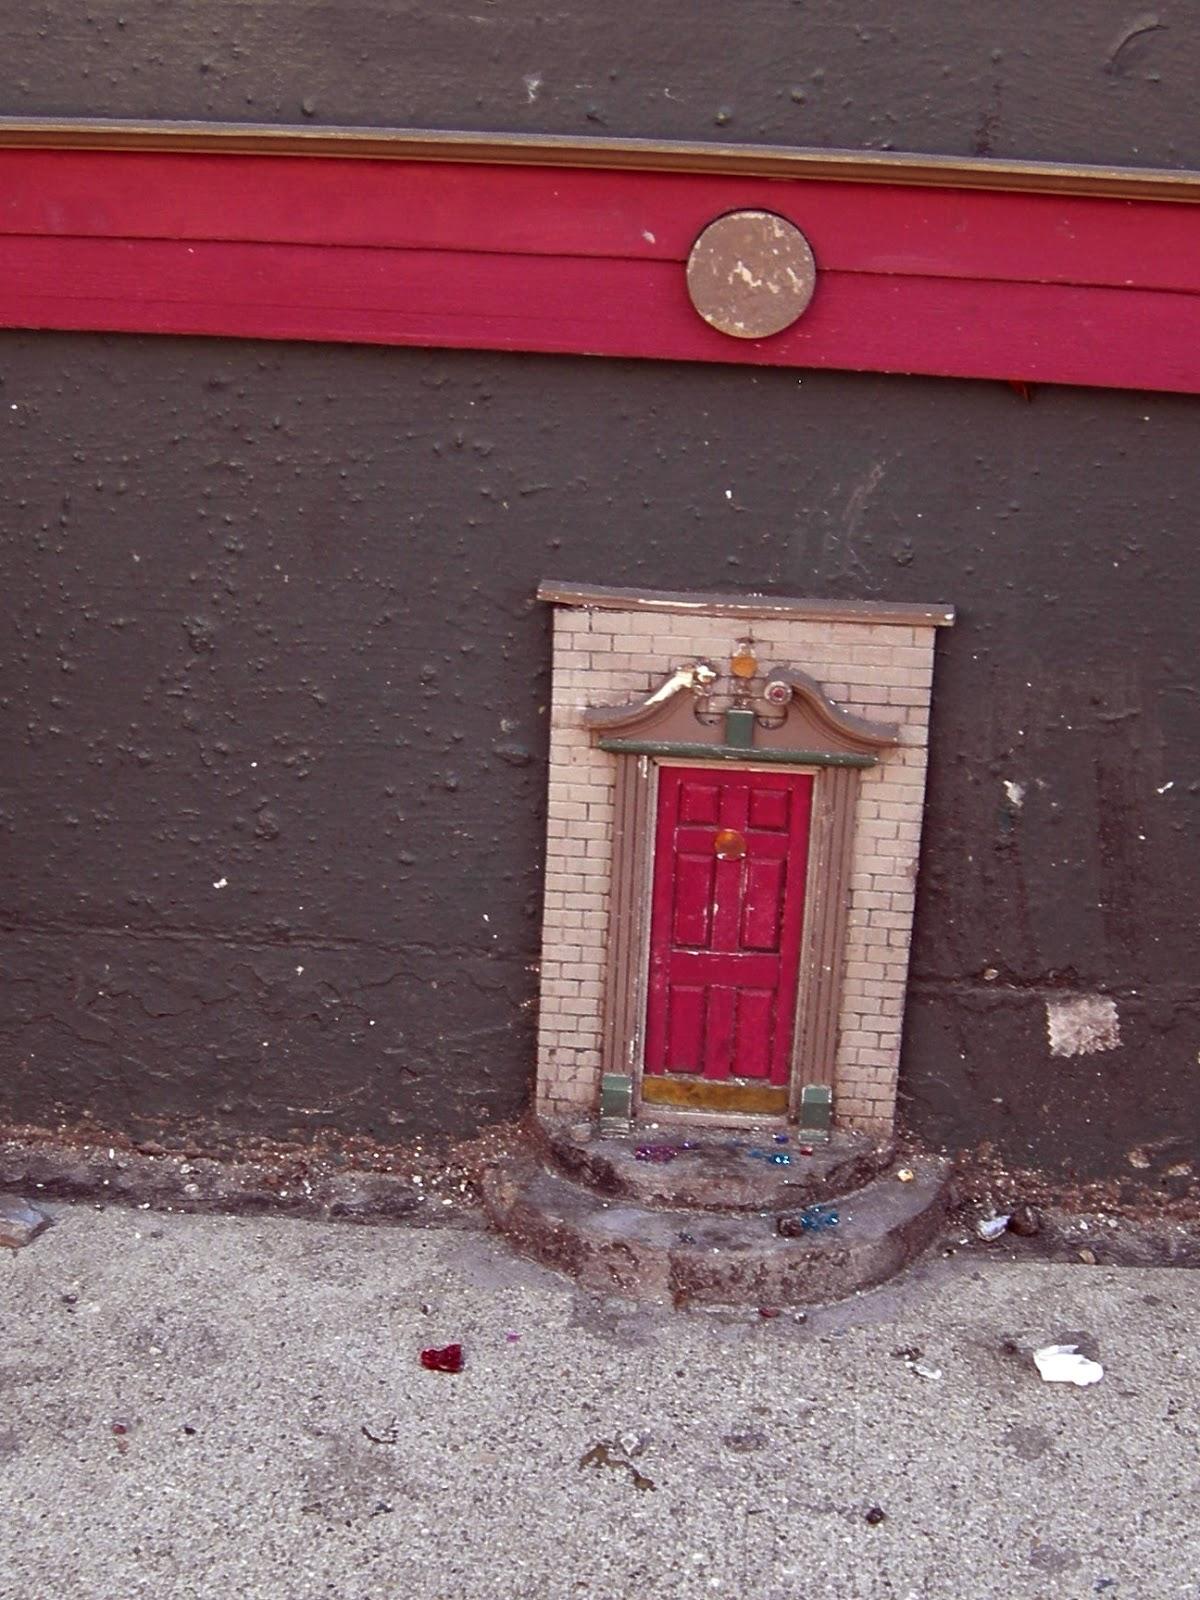 Retro Kimmer S Blog The Urban Fairy Doors Of Ann Arbor